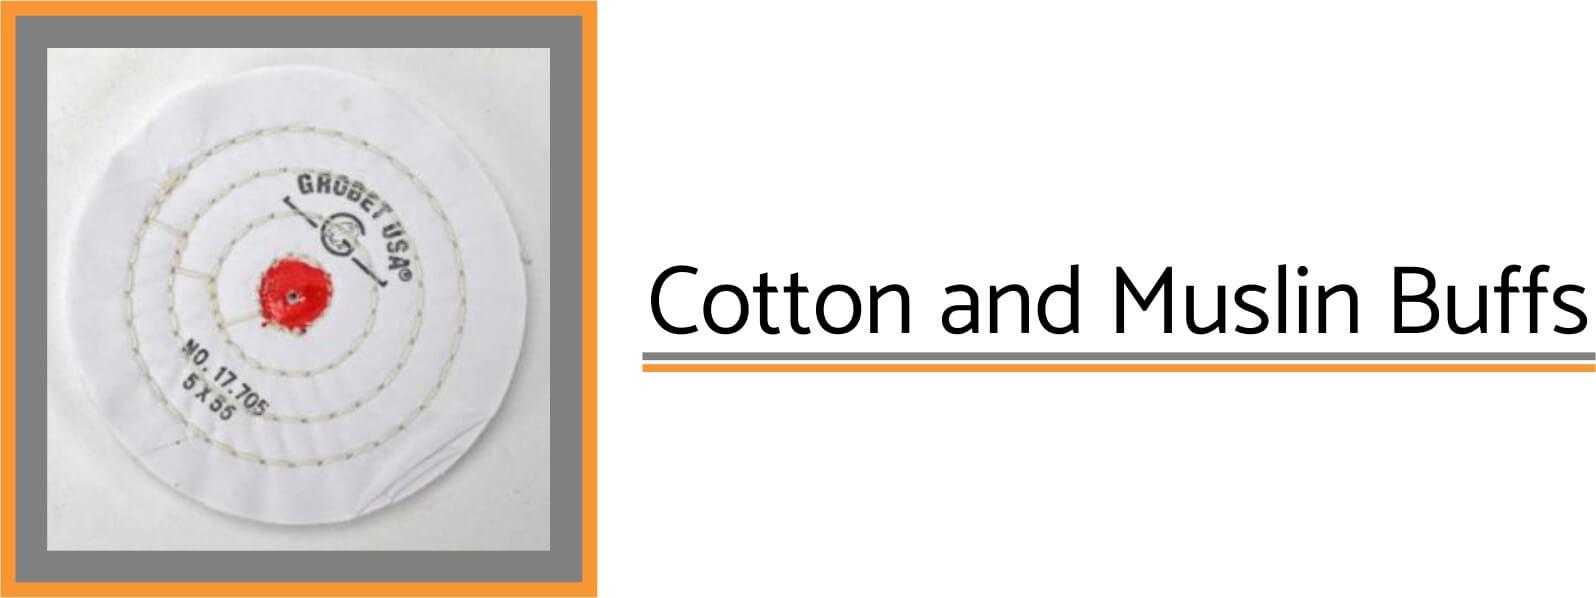 Cotton & muslin buffing & polishing